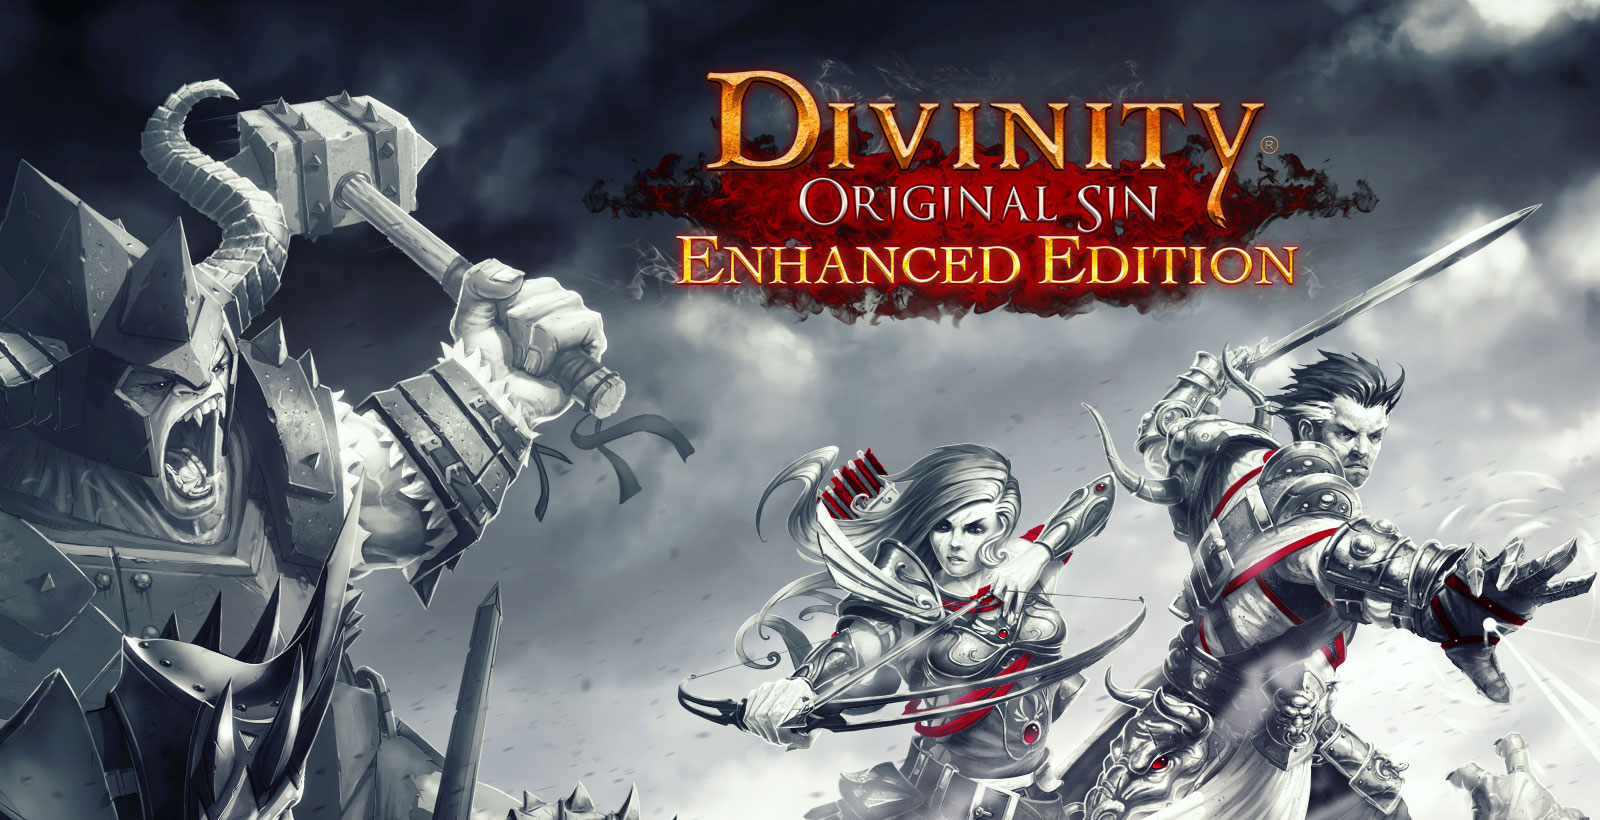 divinity_original_sinEnhanced_Edition_1600-1200.jpg